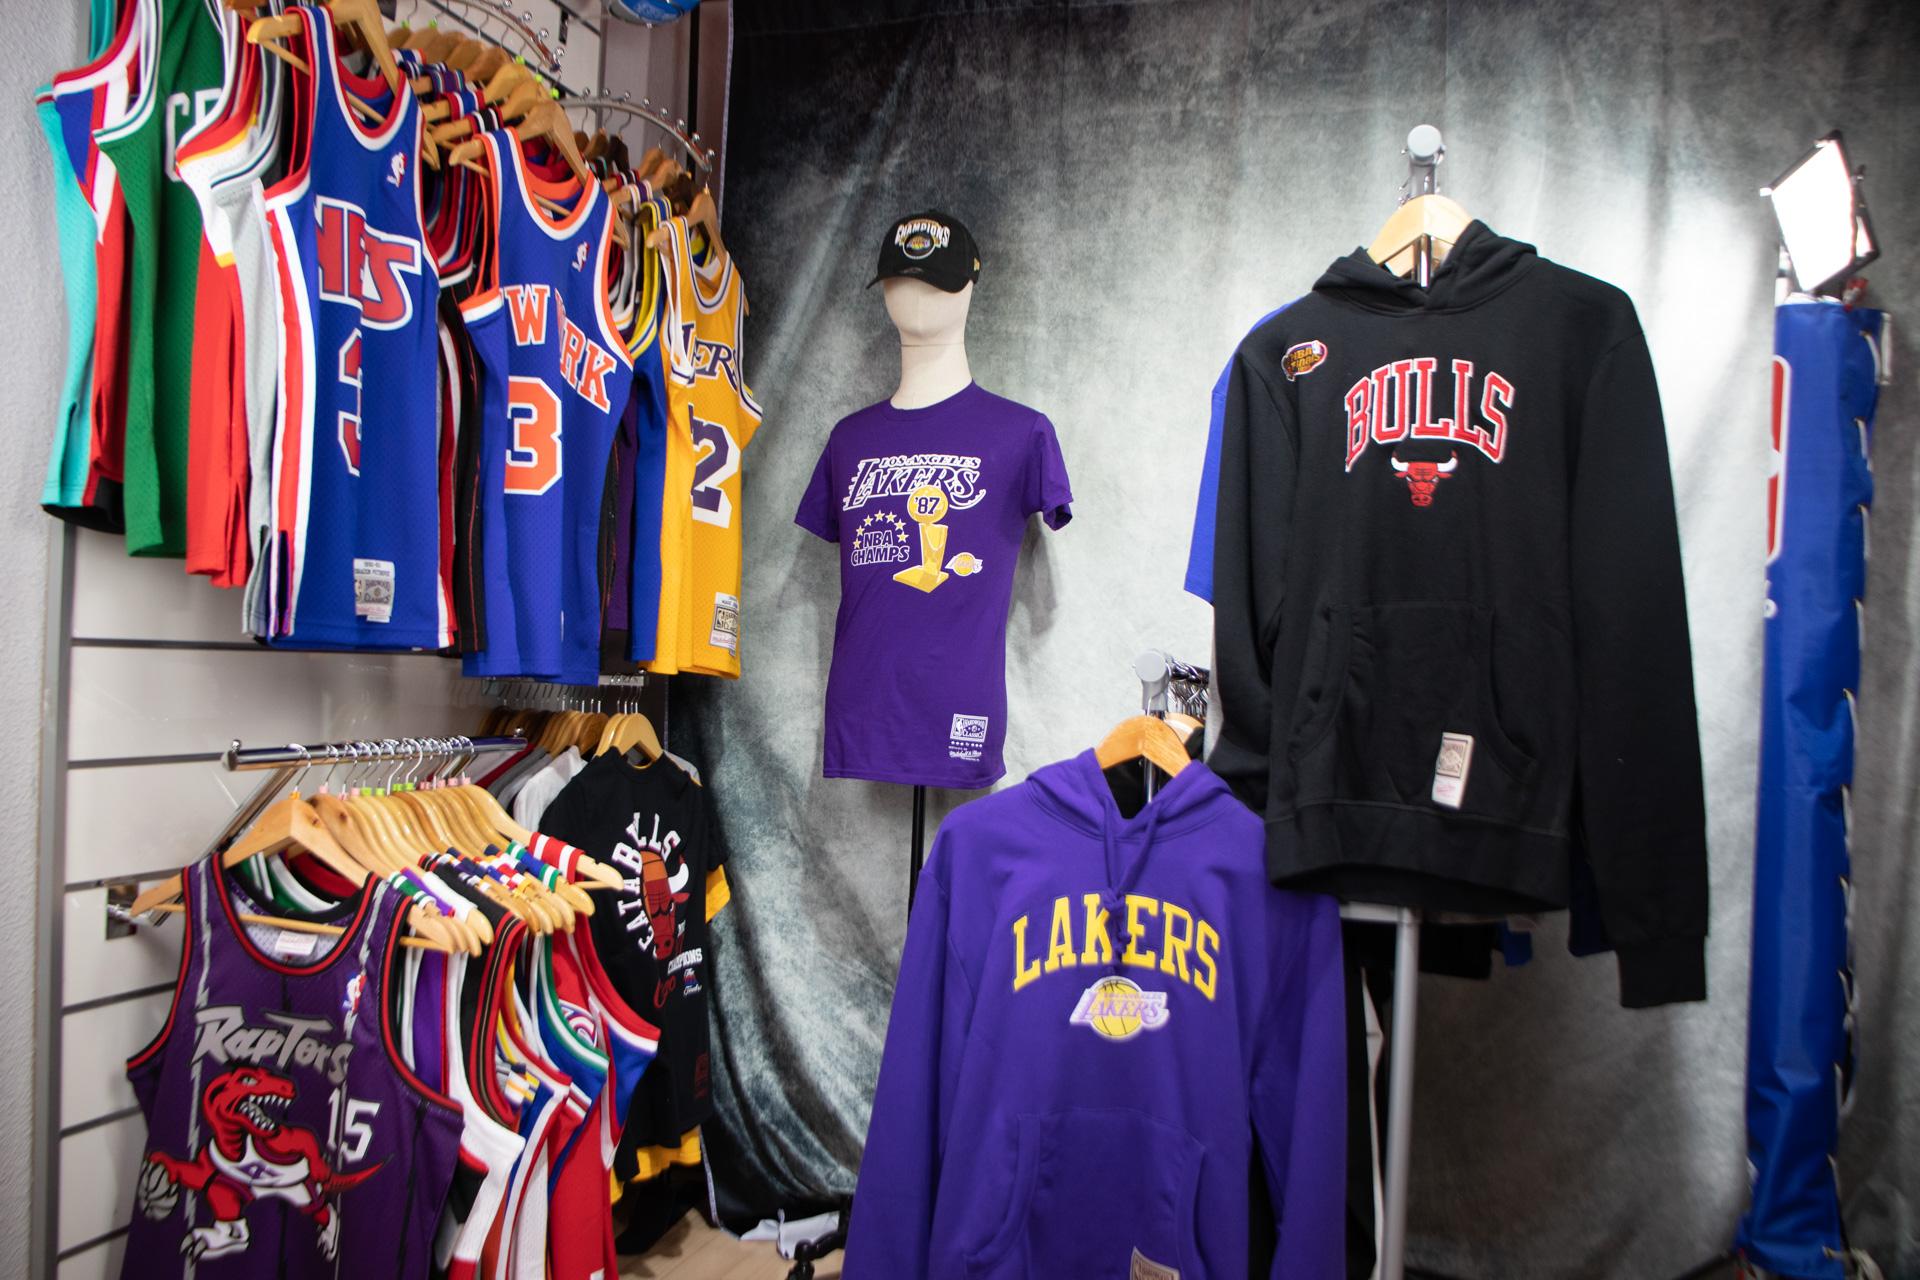 Ropa NBA Hardwood Classics. Sugerencias regalos Navidad 2020. Basketspirit.com